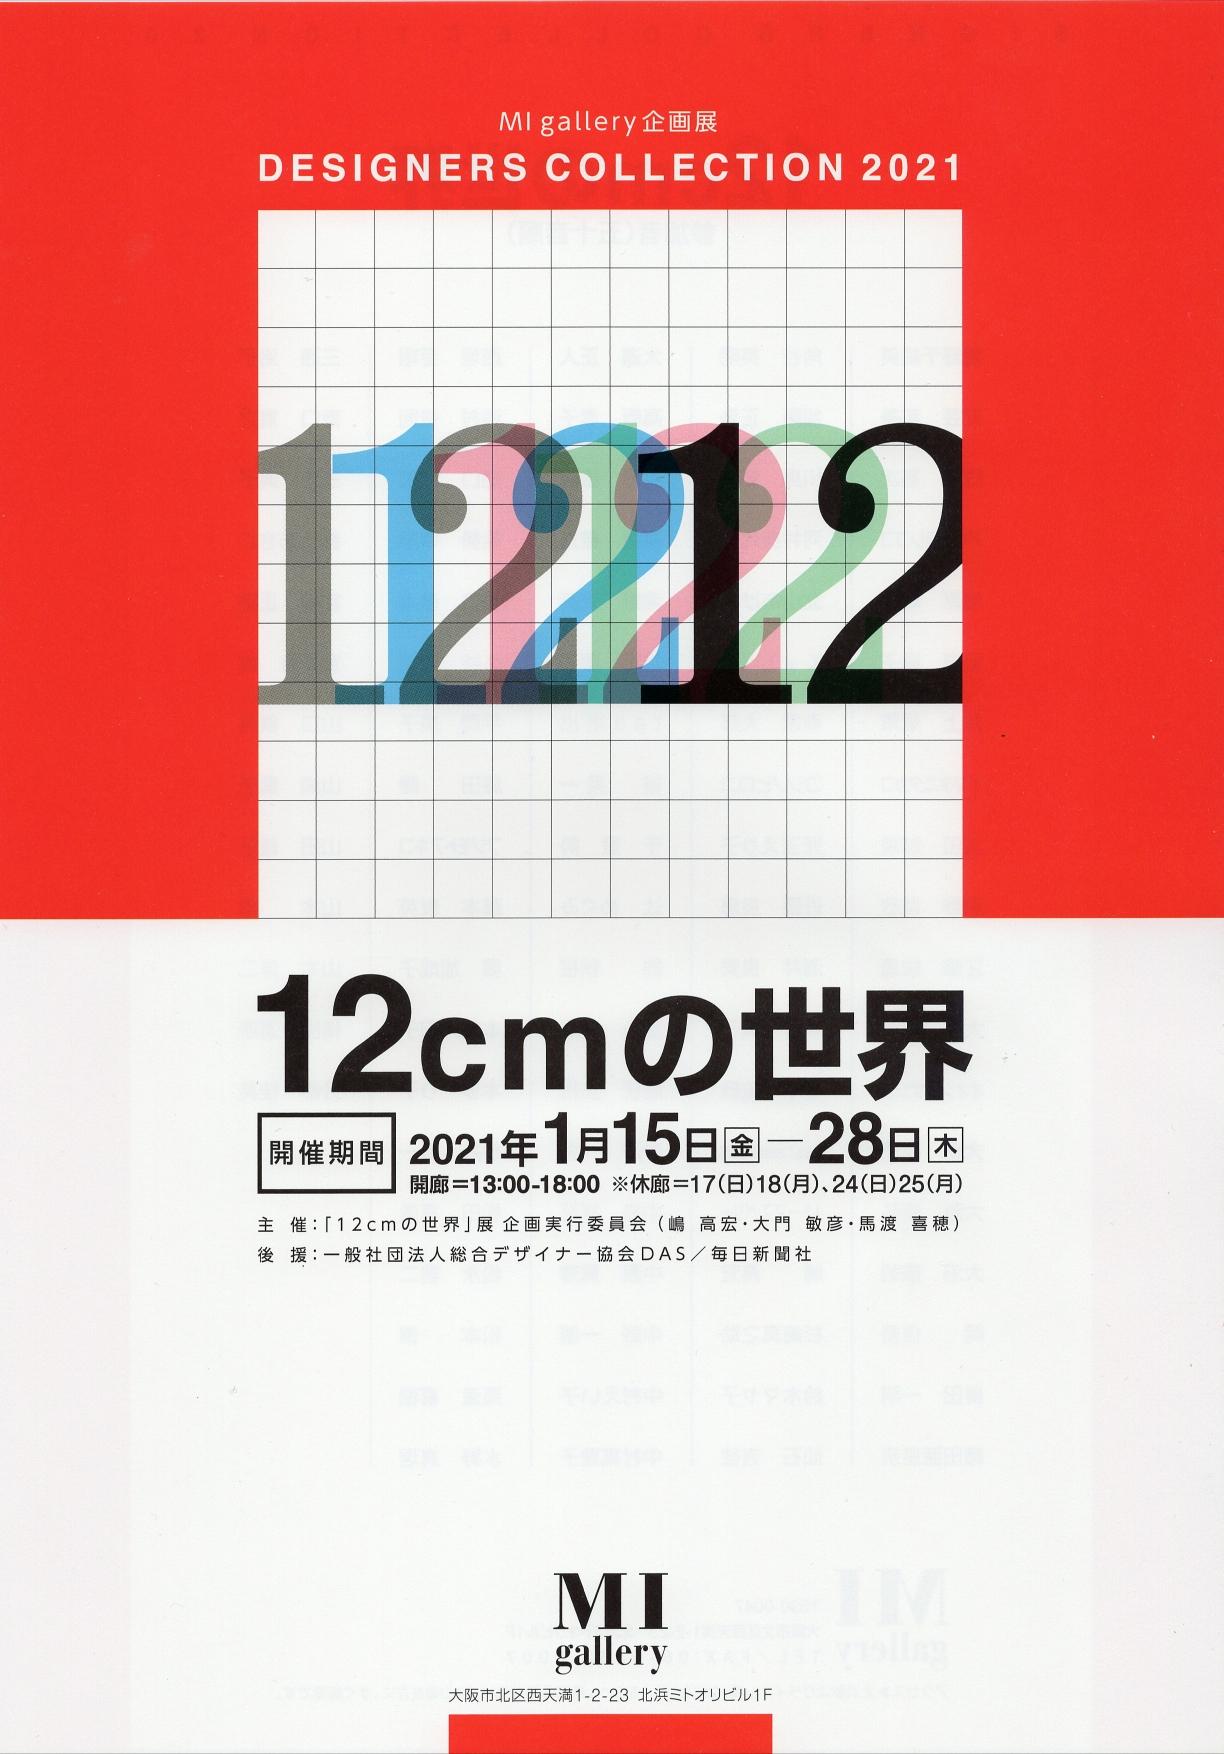 Exhibition 1. 15- 28「12cmの世界」展 (日•月曜休廊)*会場: MI garelly 終了しました